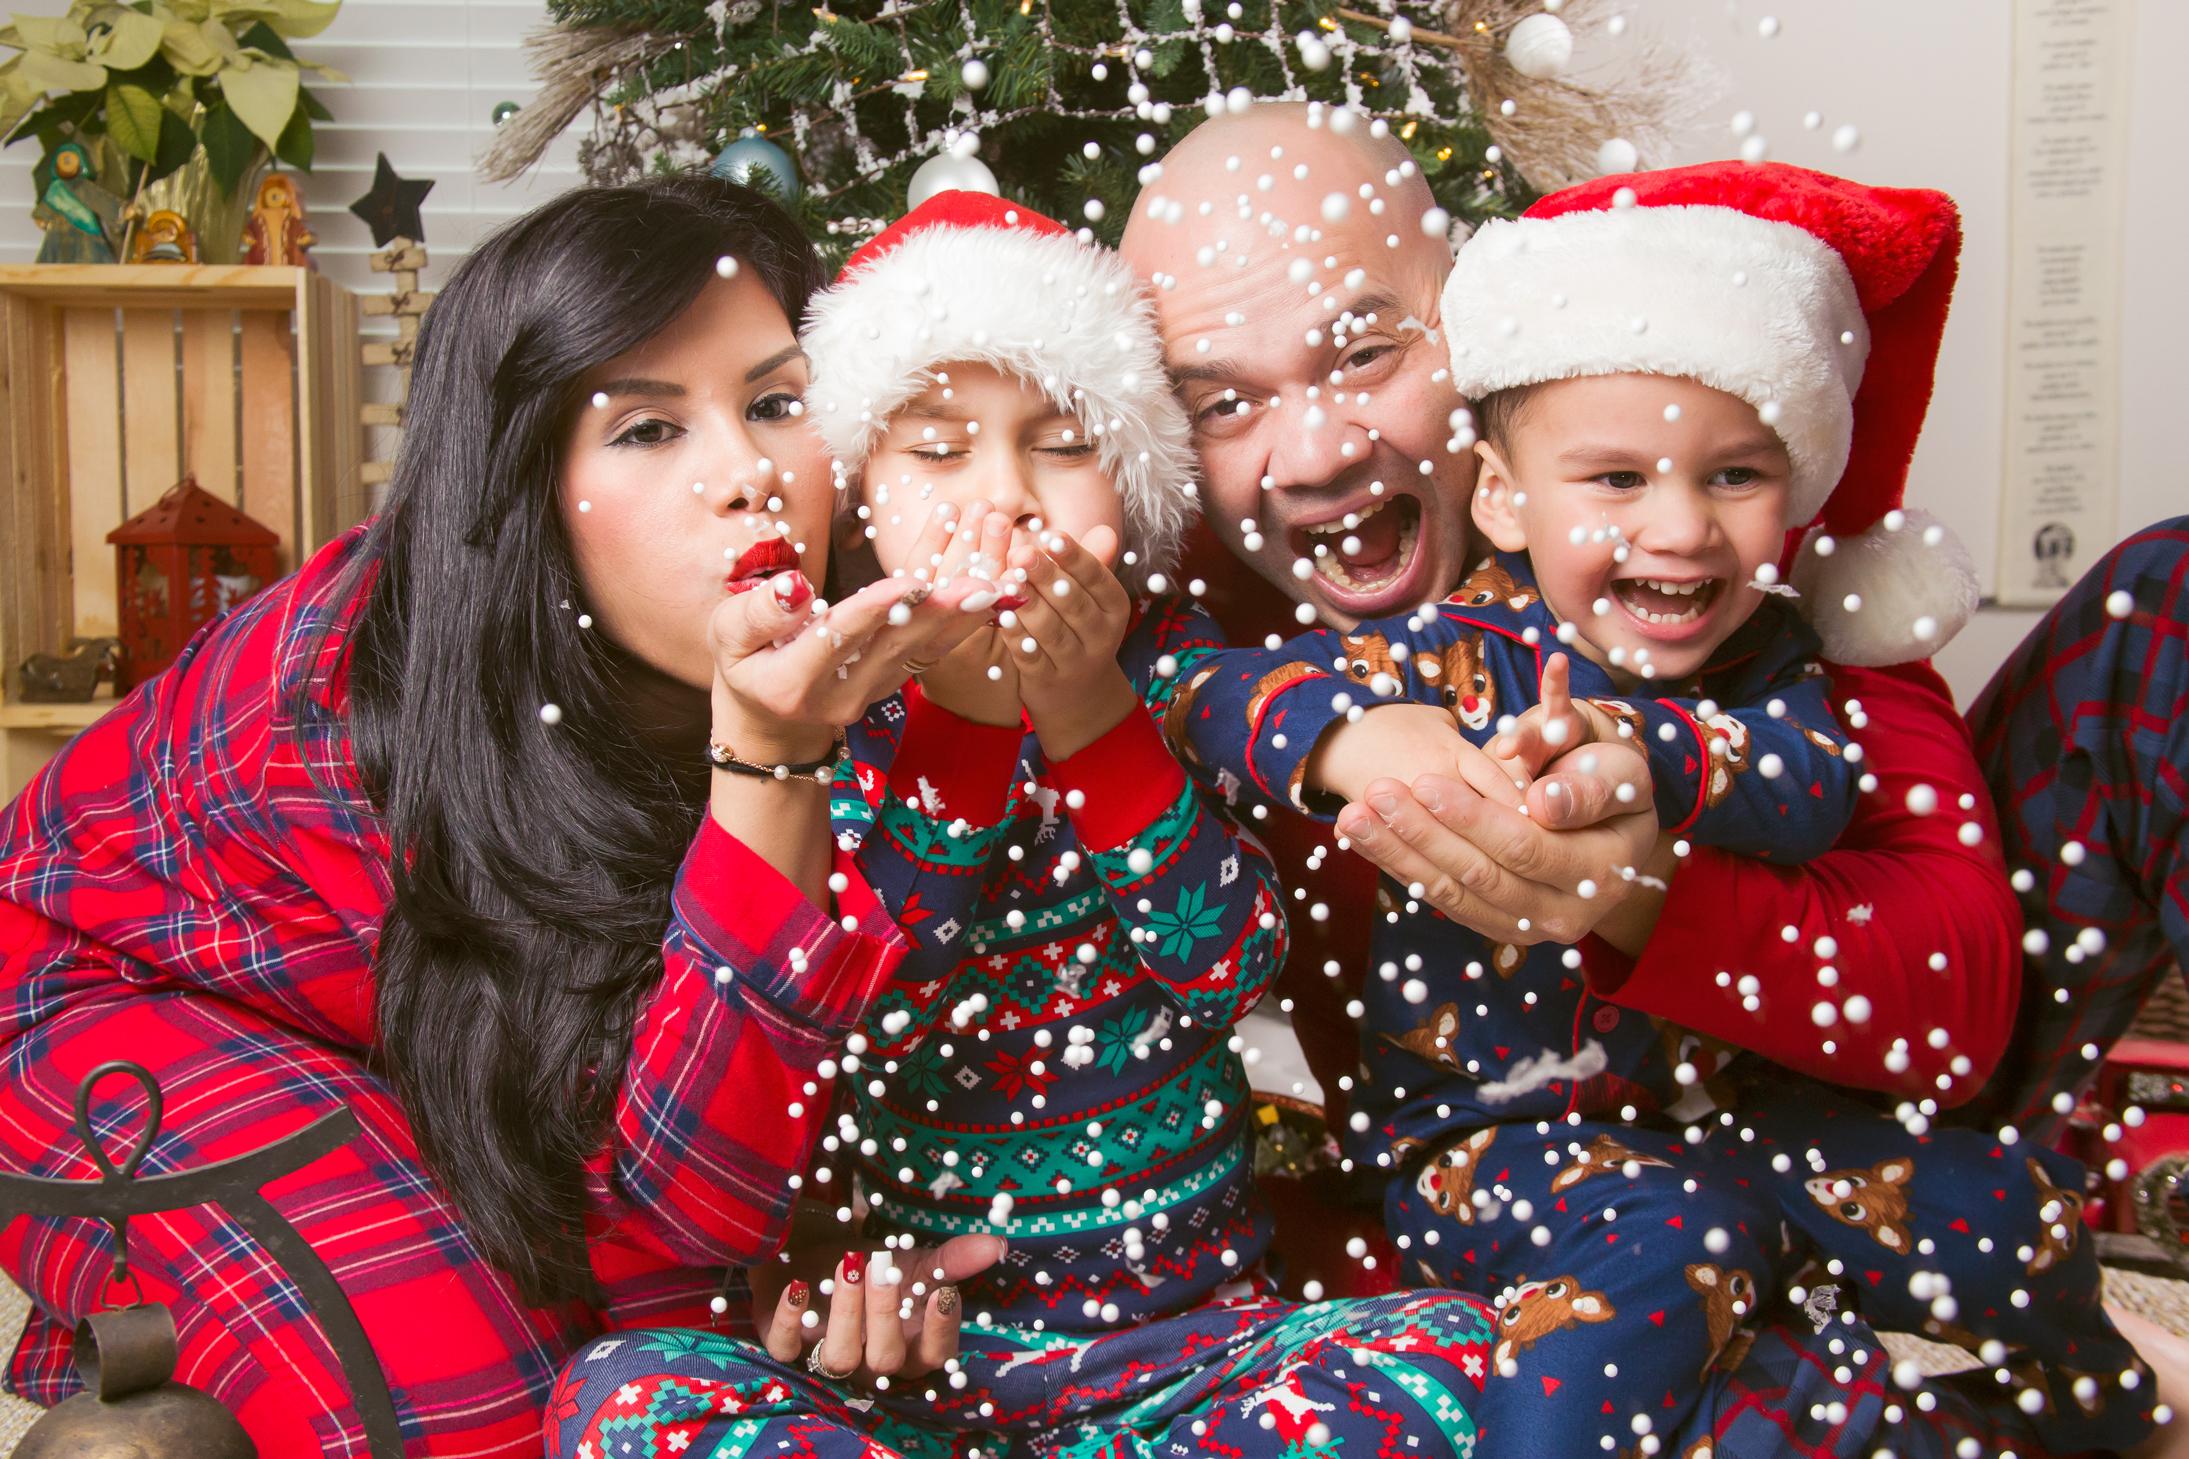 family-christmas-photo-chamber-photography-moments-antoine-hart-4.jpg